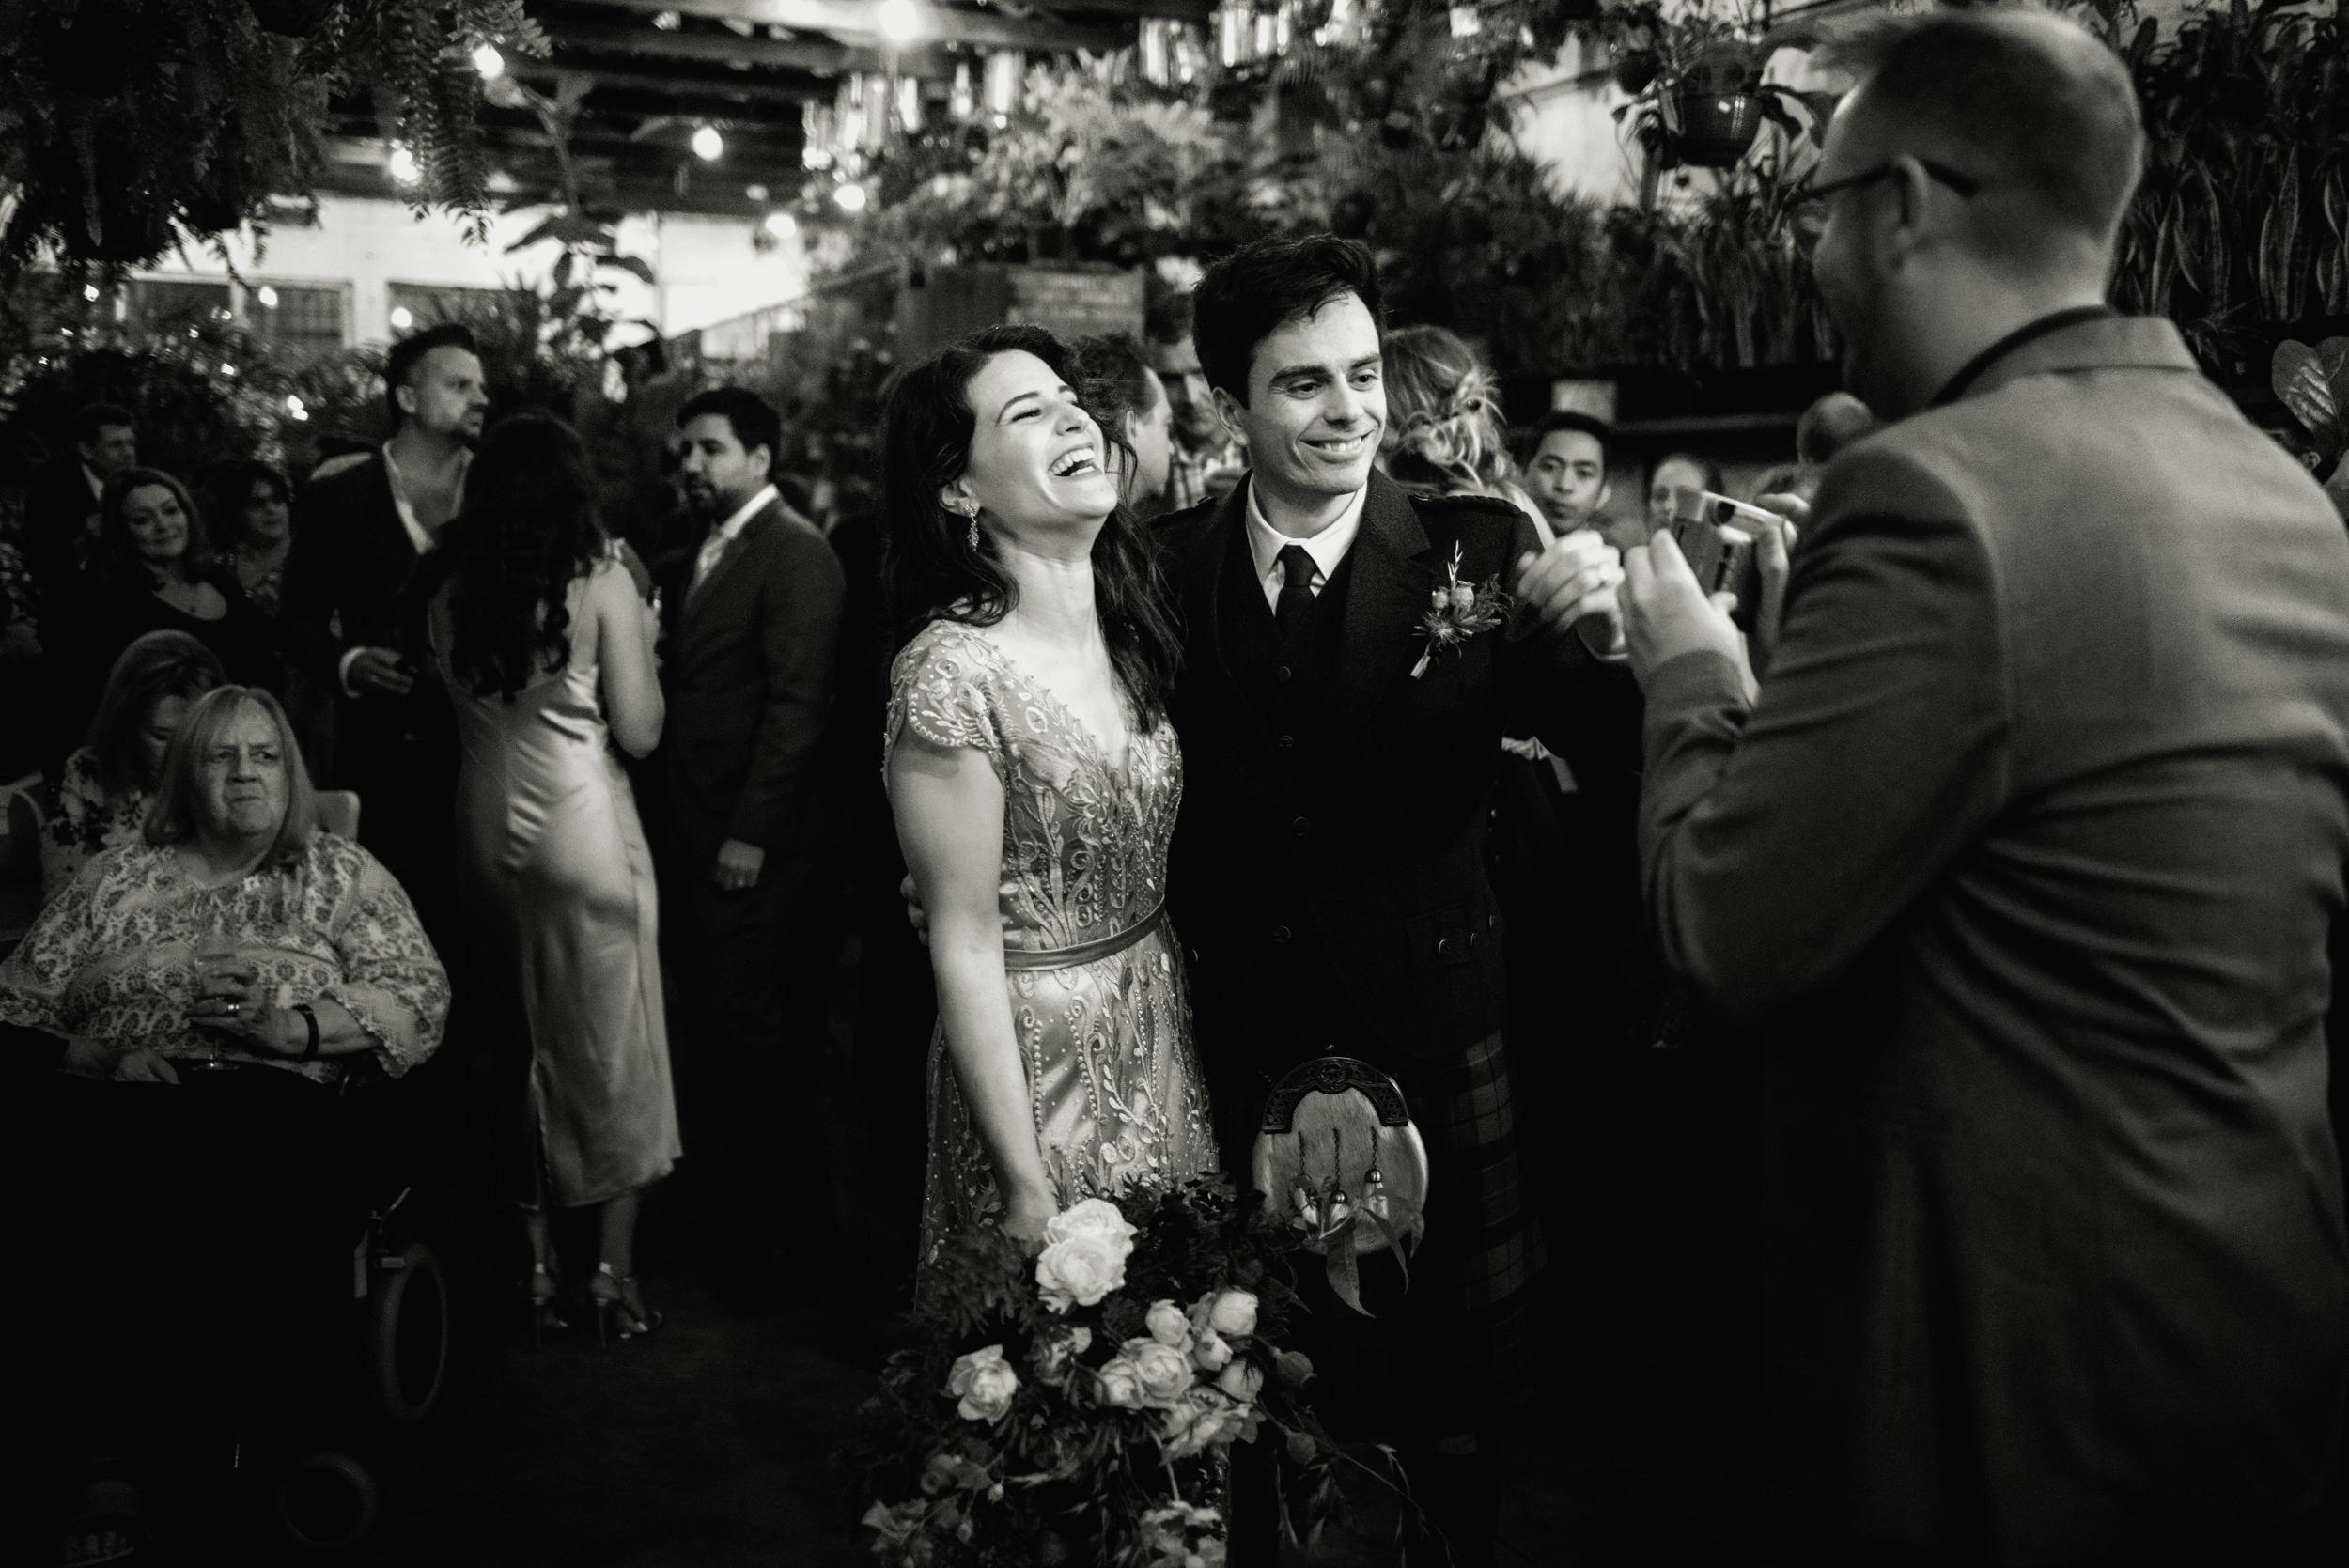 I-Got-You-Babe-&.Co.-Glasshaus-Wedding-Charlotte-Cameron0118.JPG